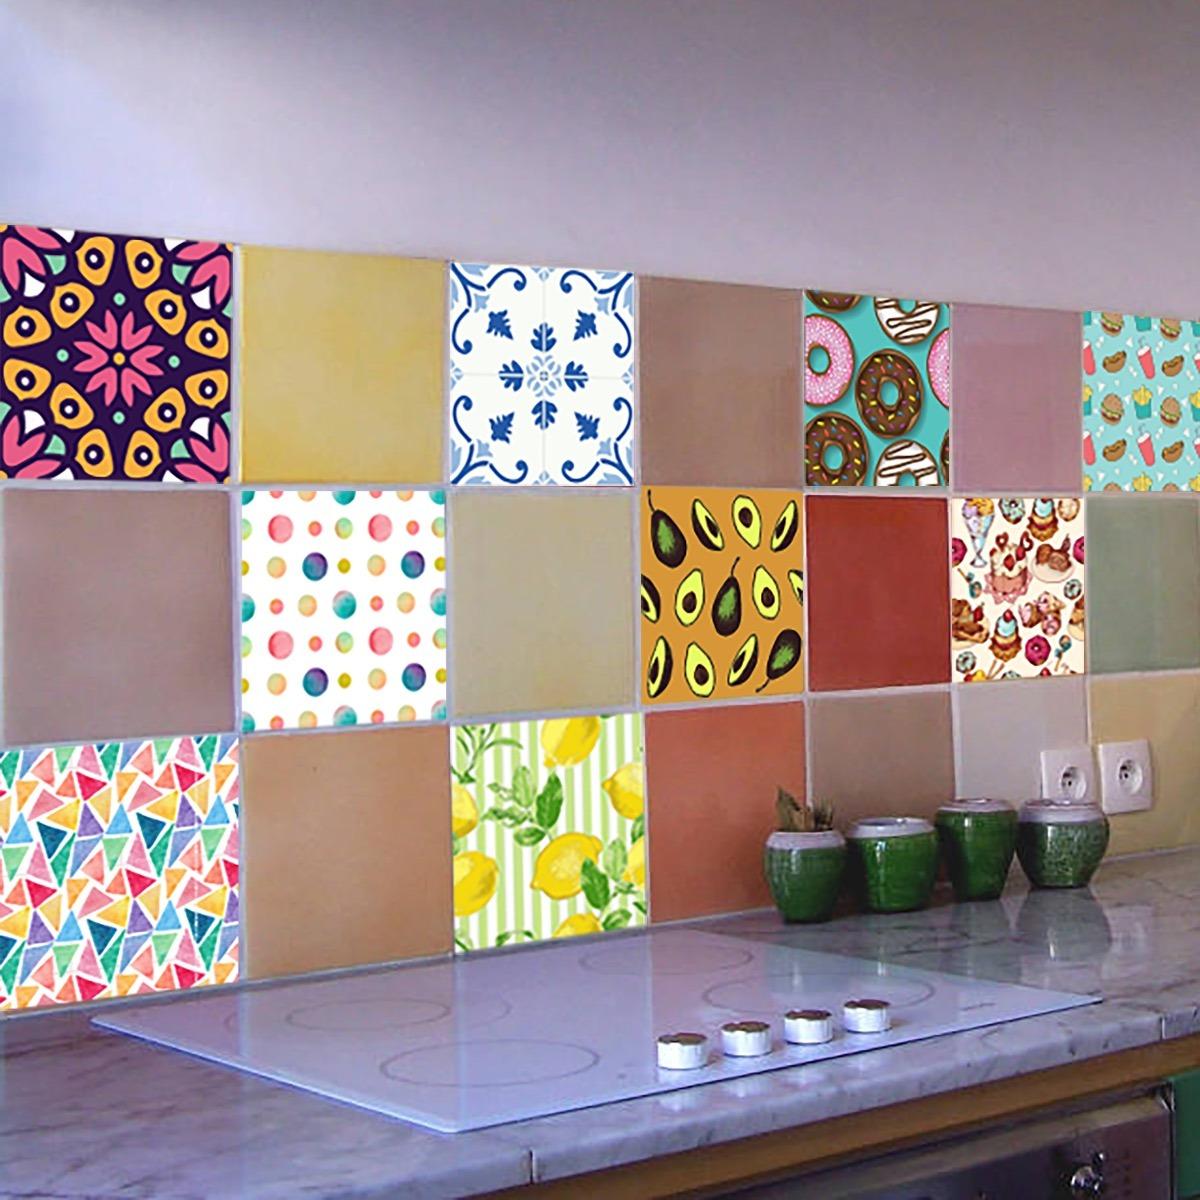 Vinilos decorativos azulejos ba o vinilos azulejos ba o for Vinilos azulejos bano leroy merlin